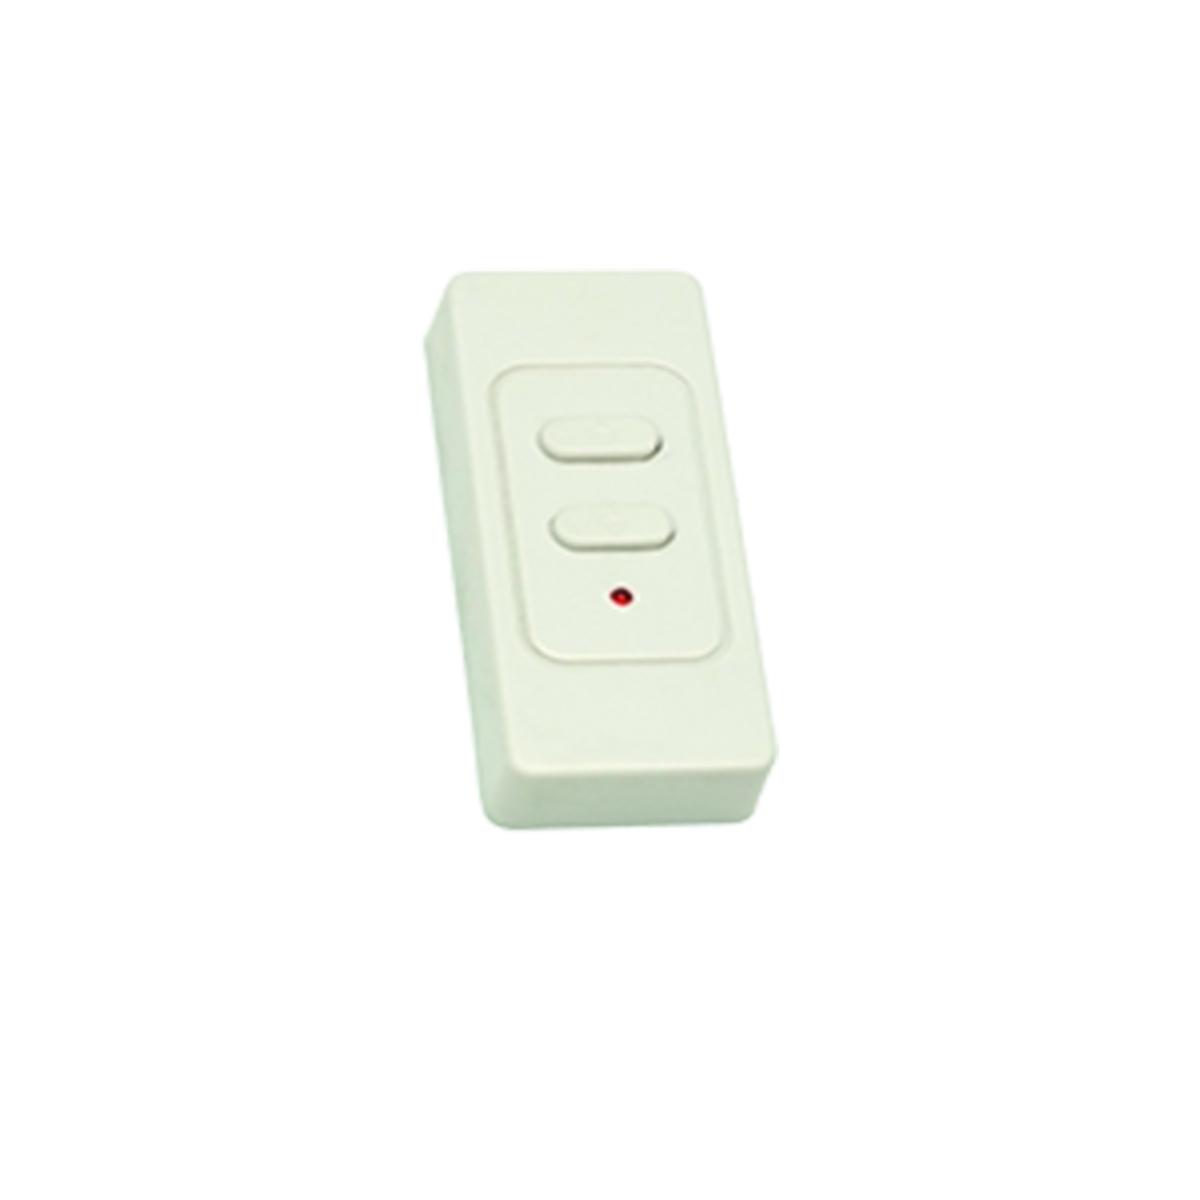 Araccess Wireless Wall mounted Button